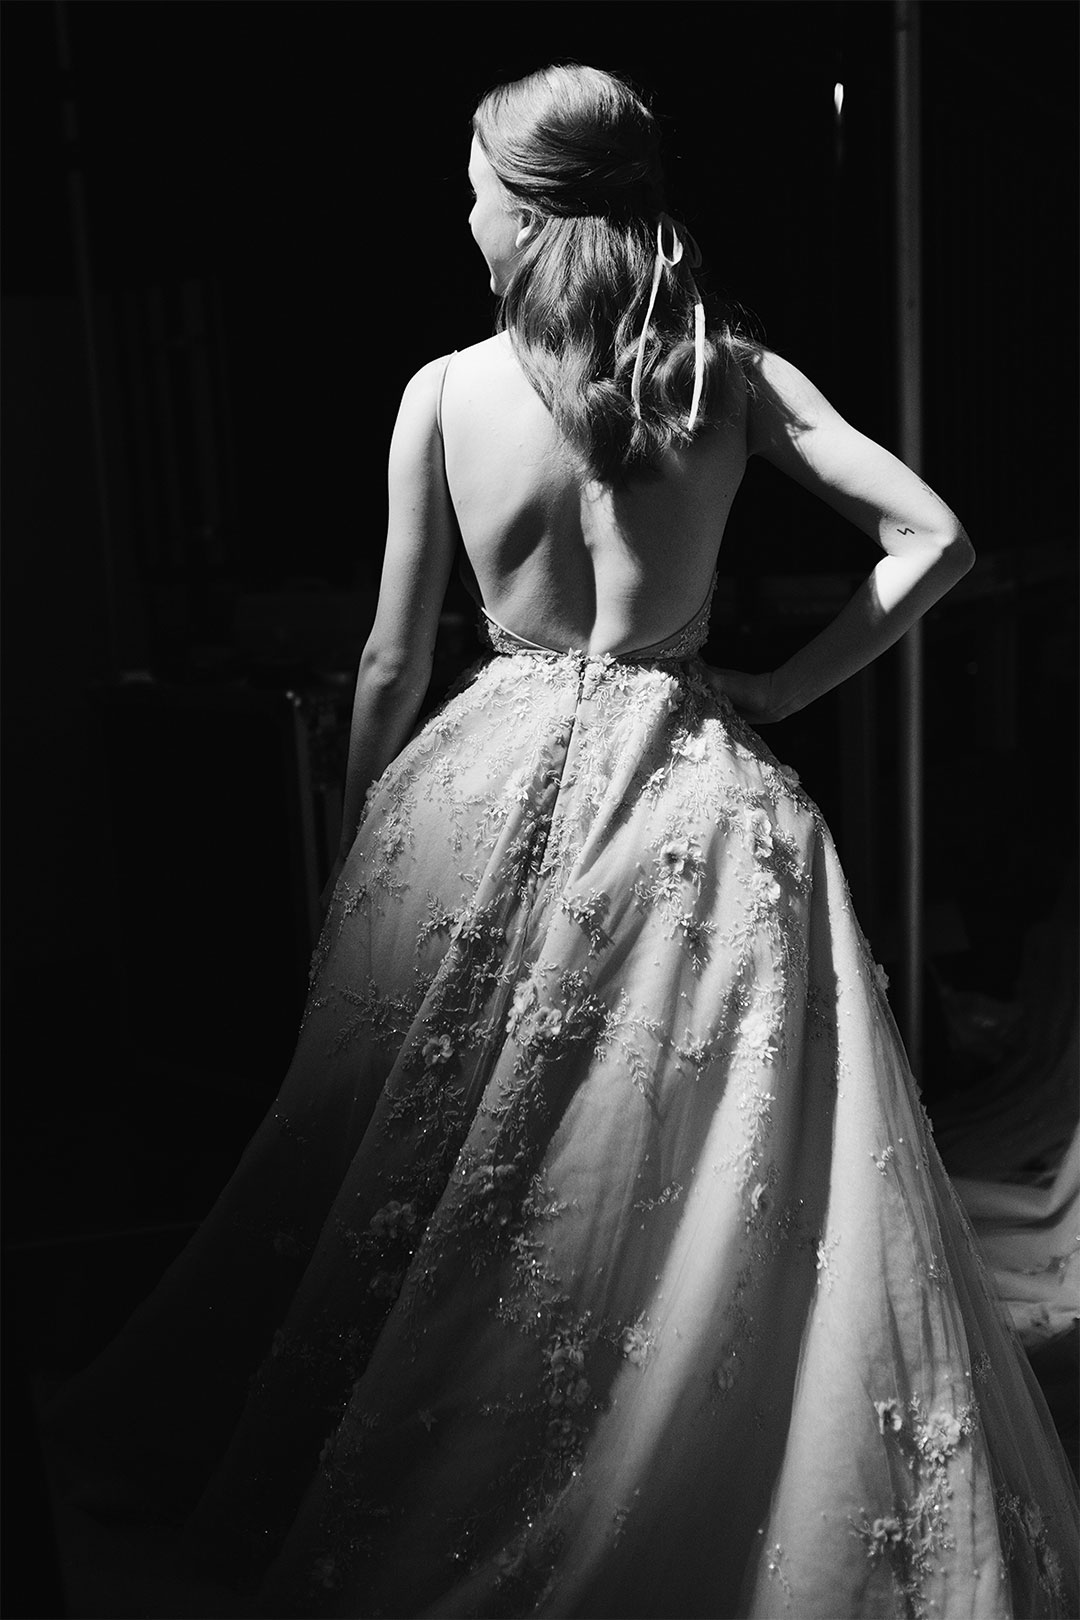 lei-lei-fashion-photographer-melbourne-australia-taylor-content.jpg